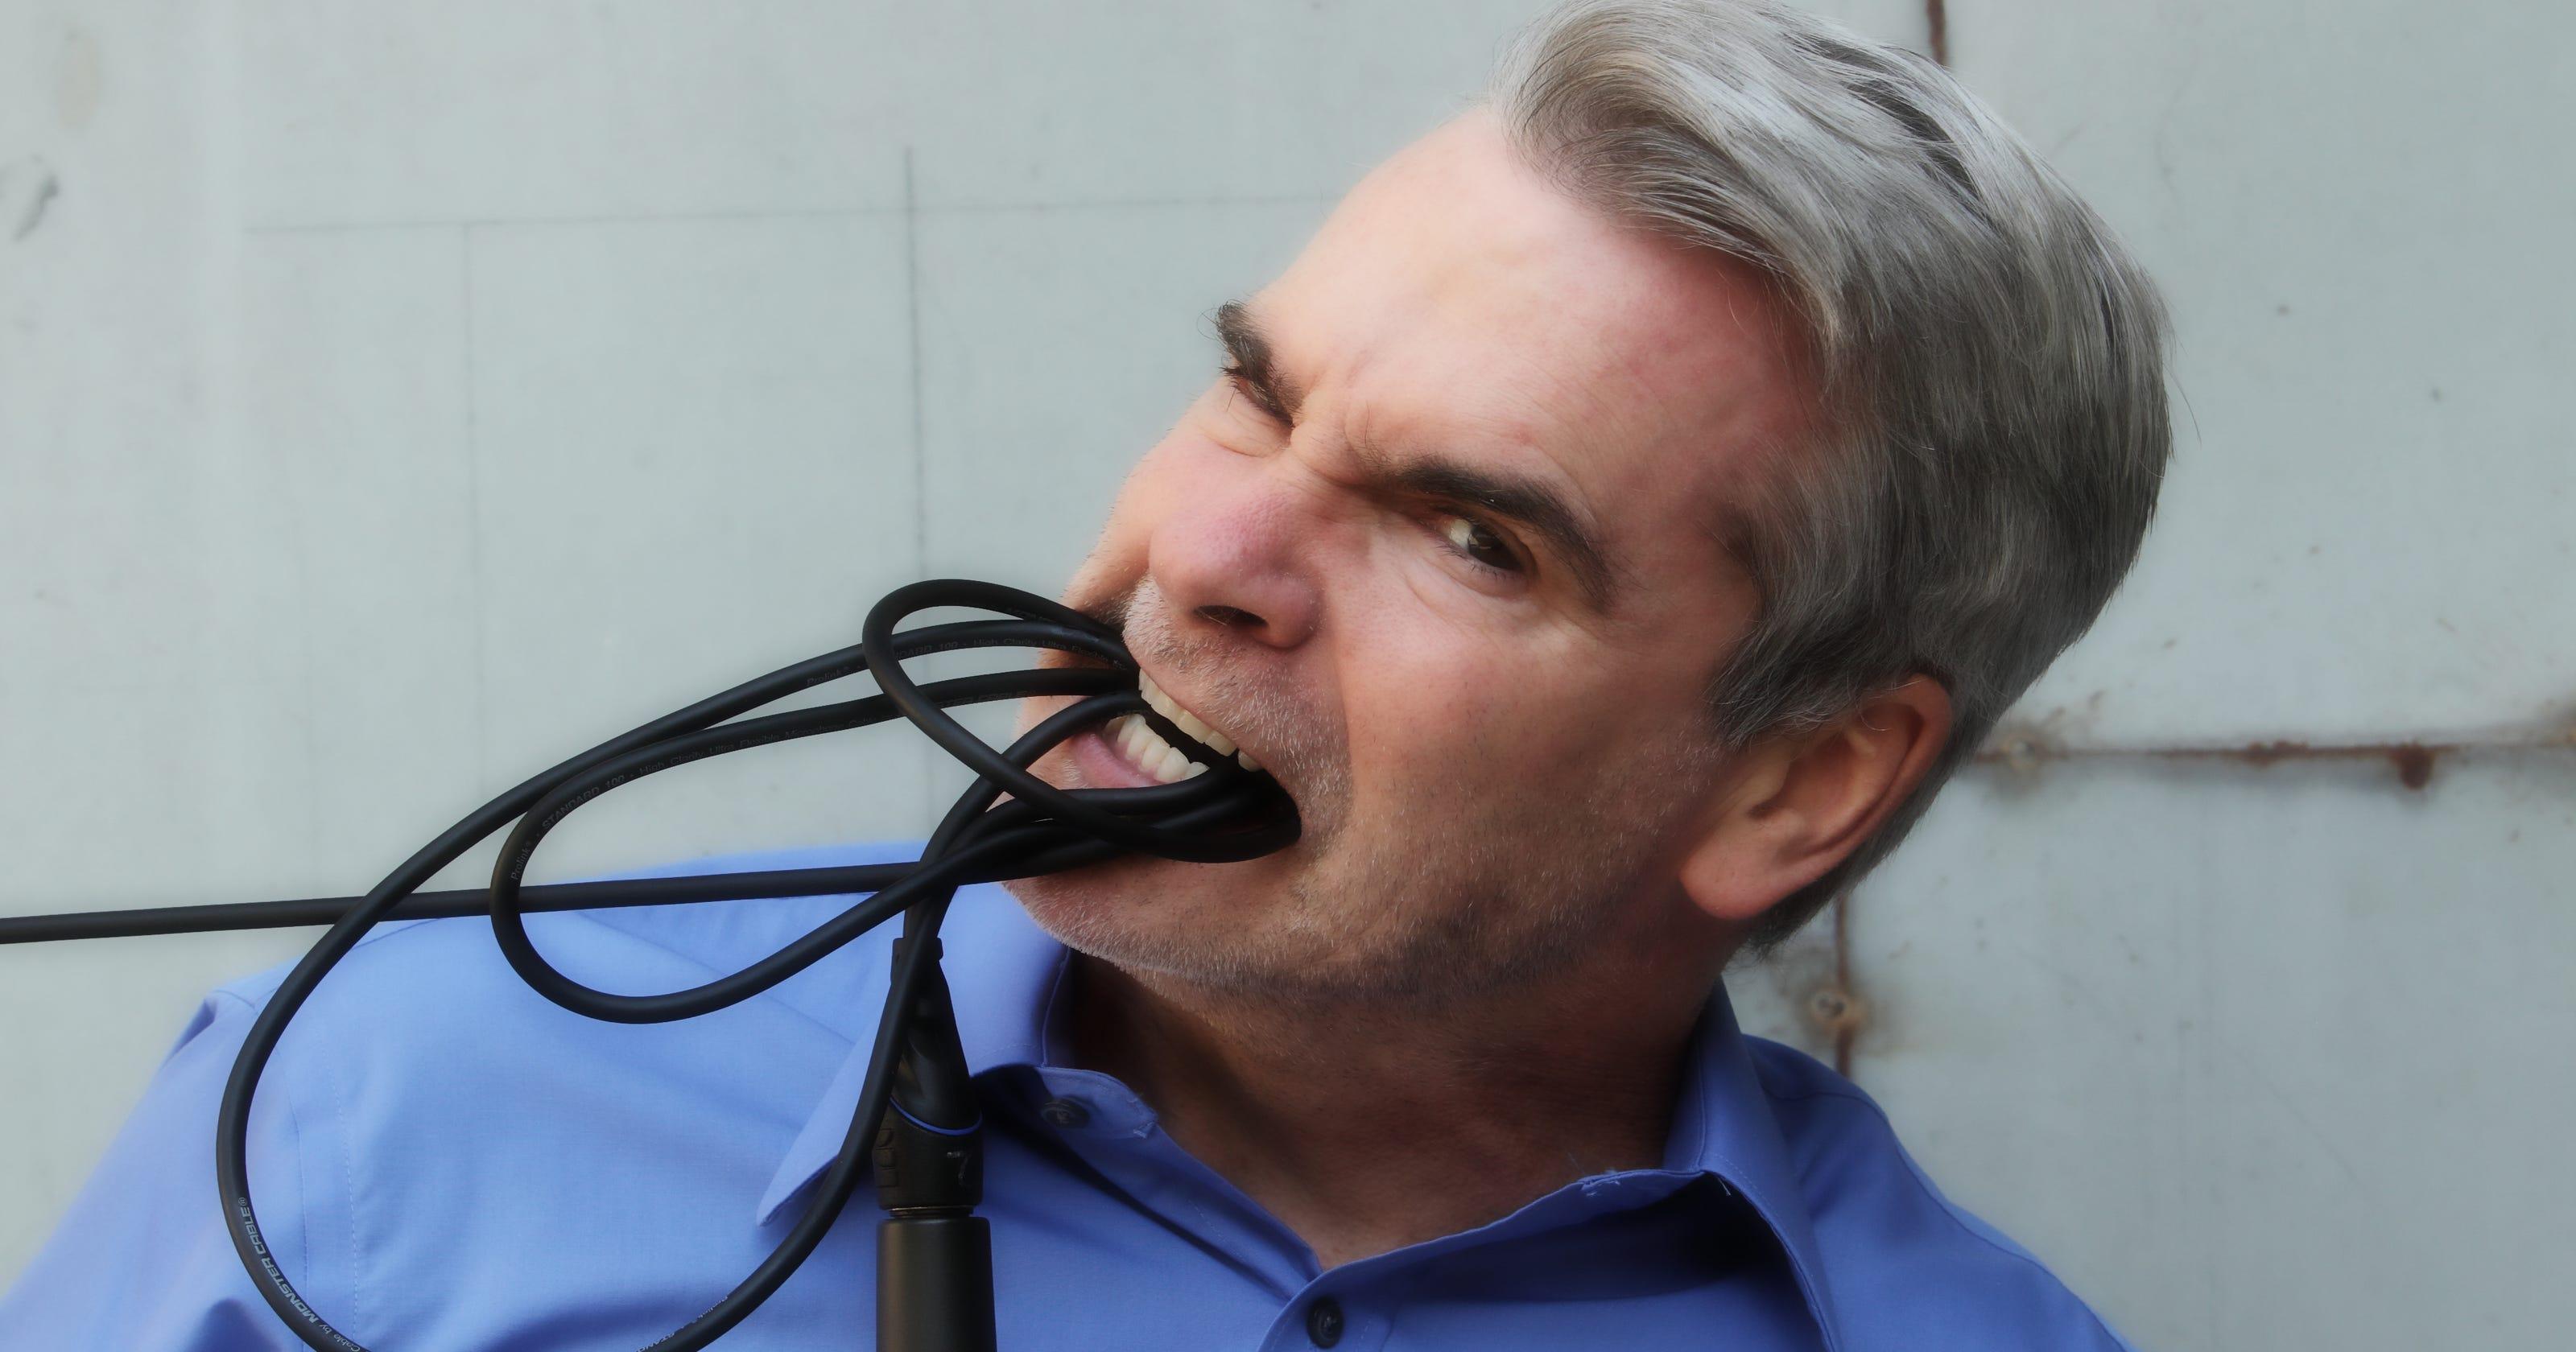 Henry Rollins full-on